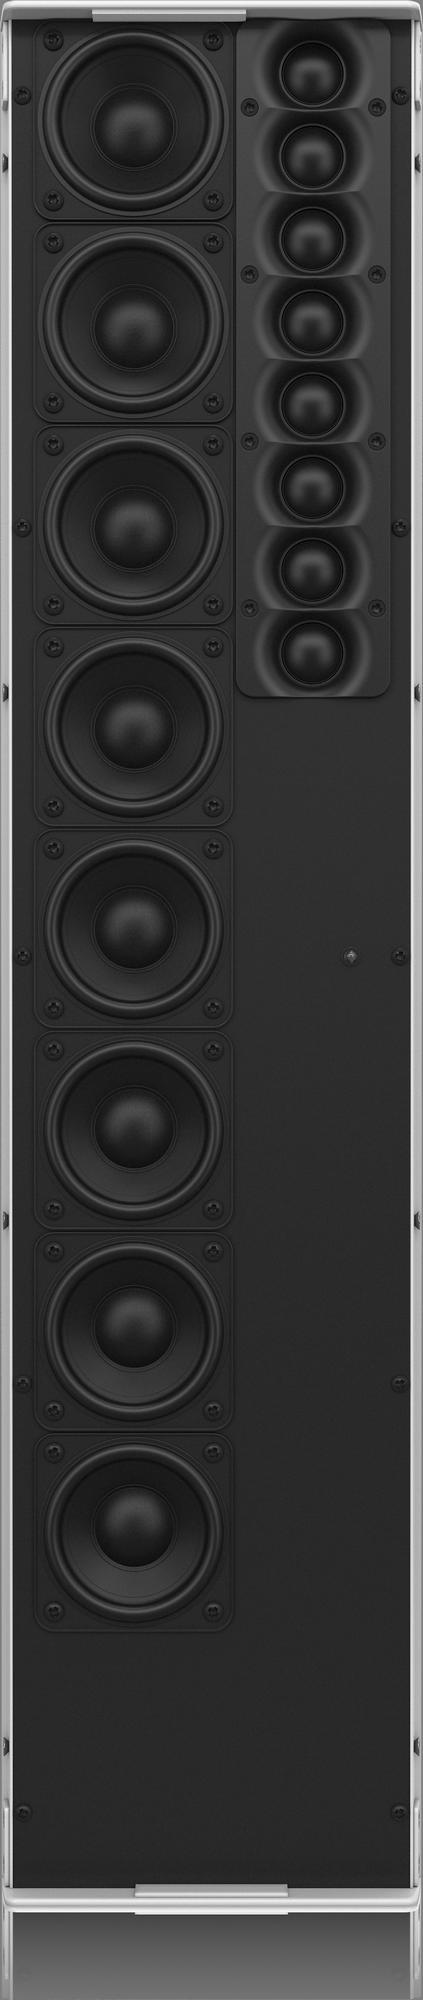 Tannoy  QFLEX 16 - Installatiespeaker